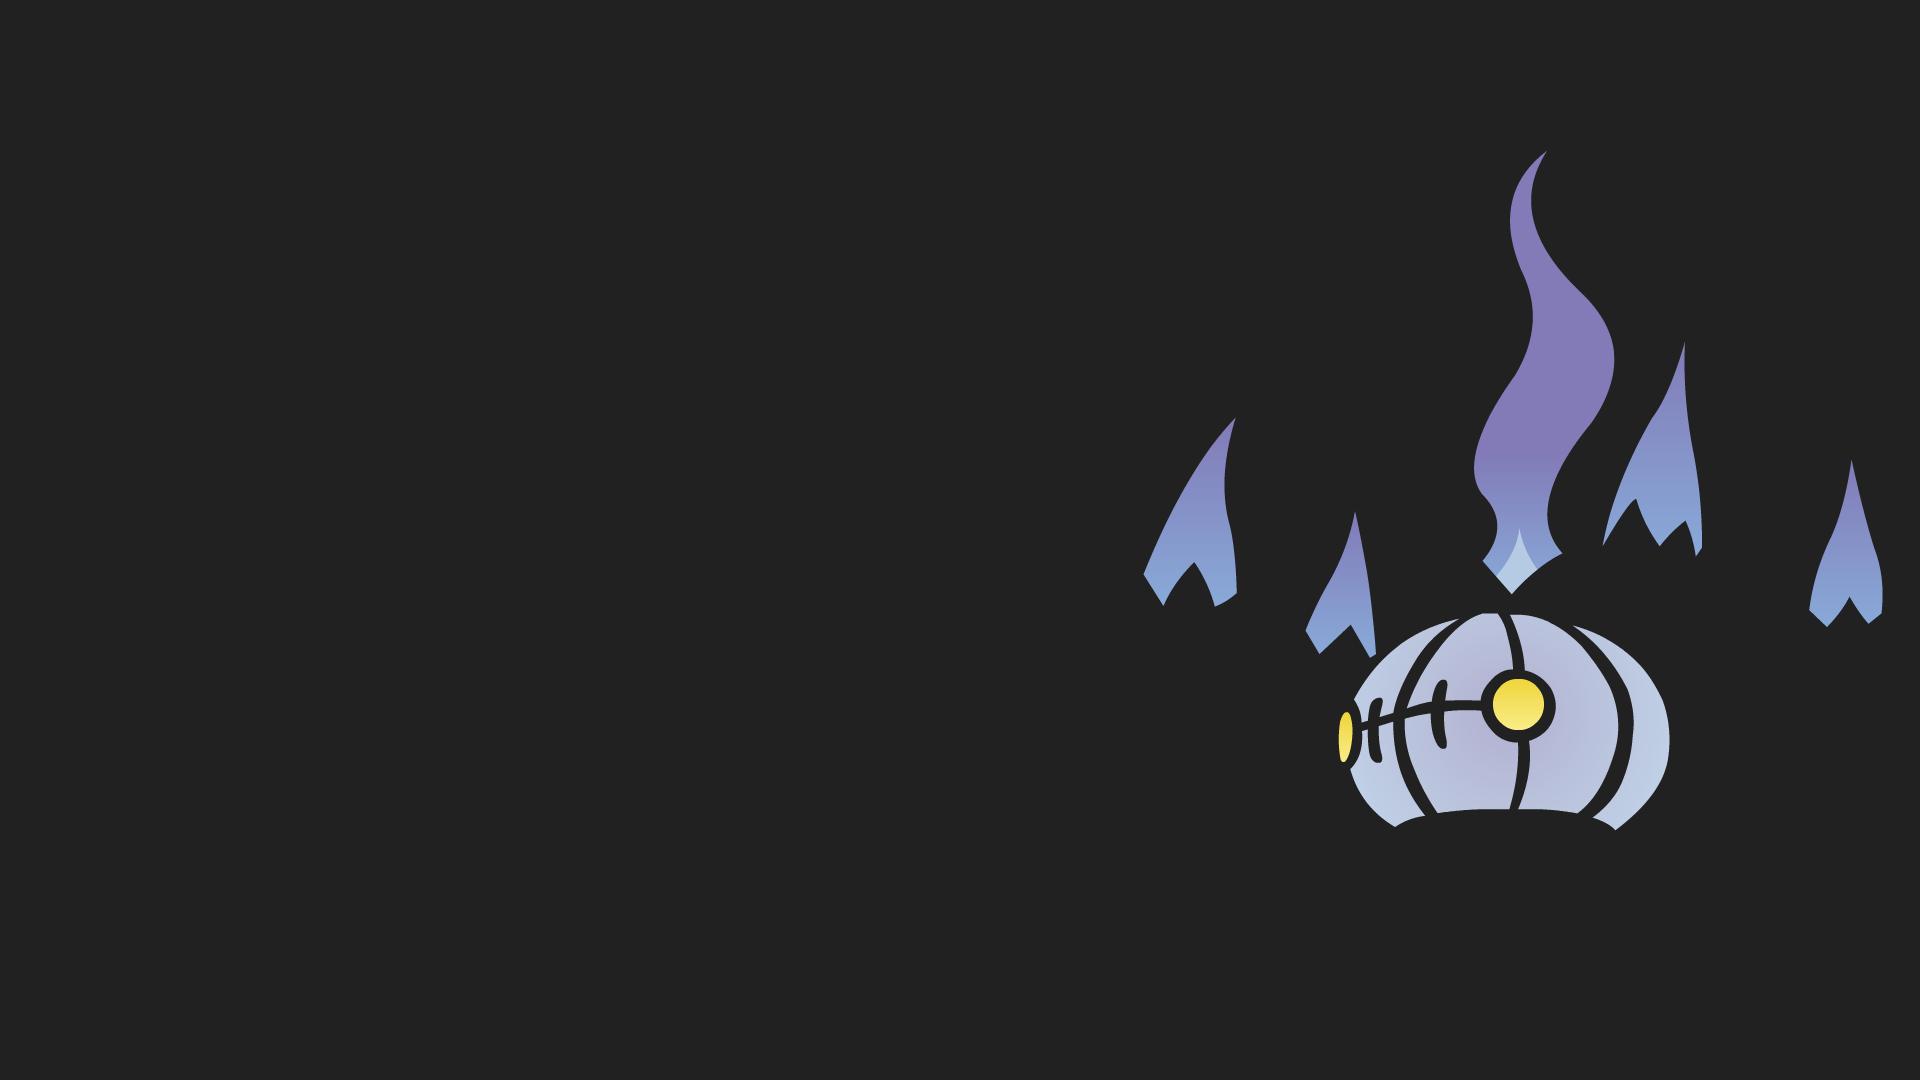 Download Pokemon Vector Wallpaper Hd Backgrounds Download